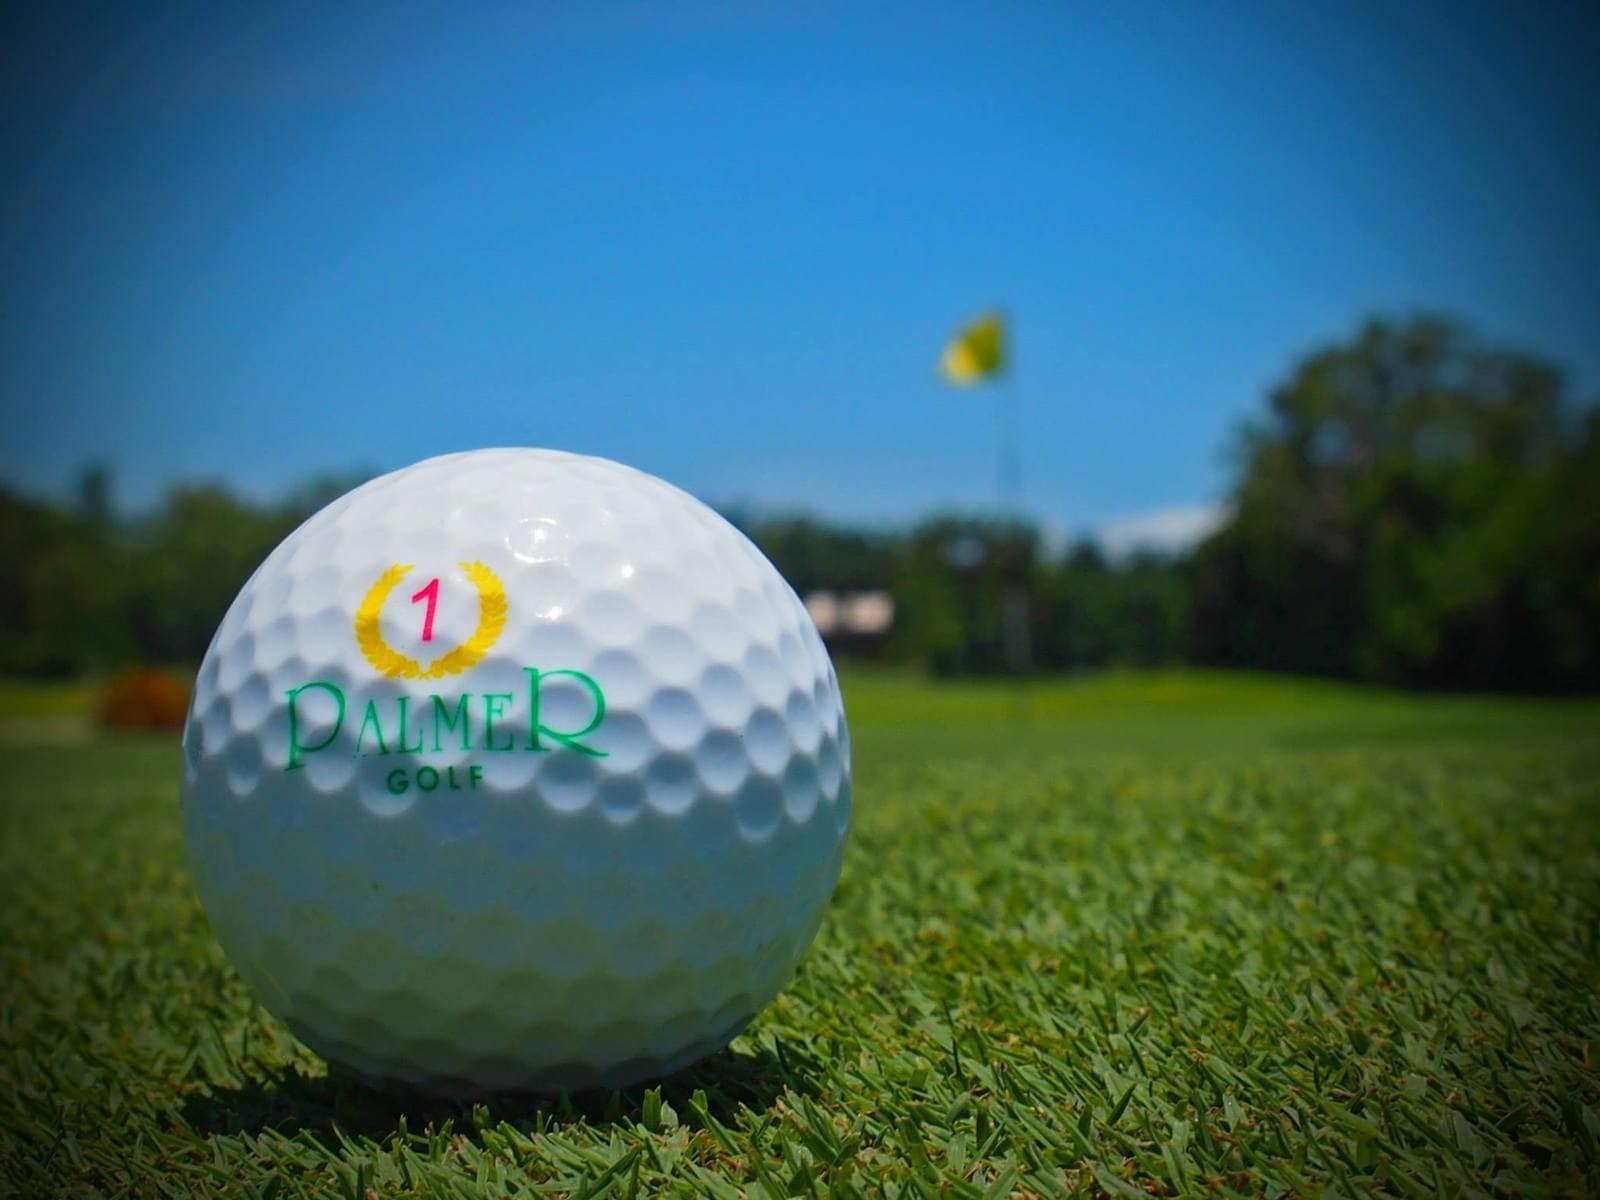 palmer golf